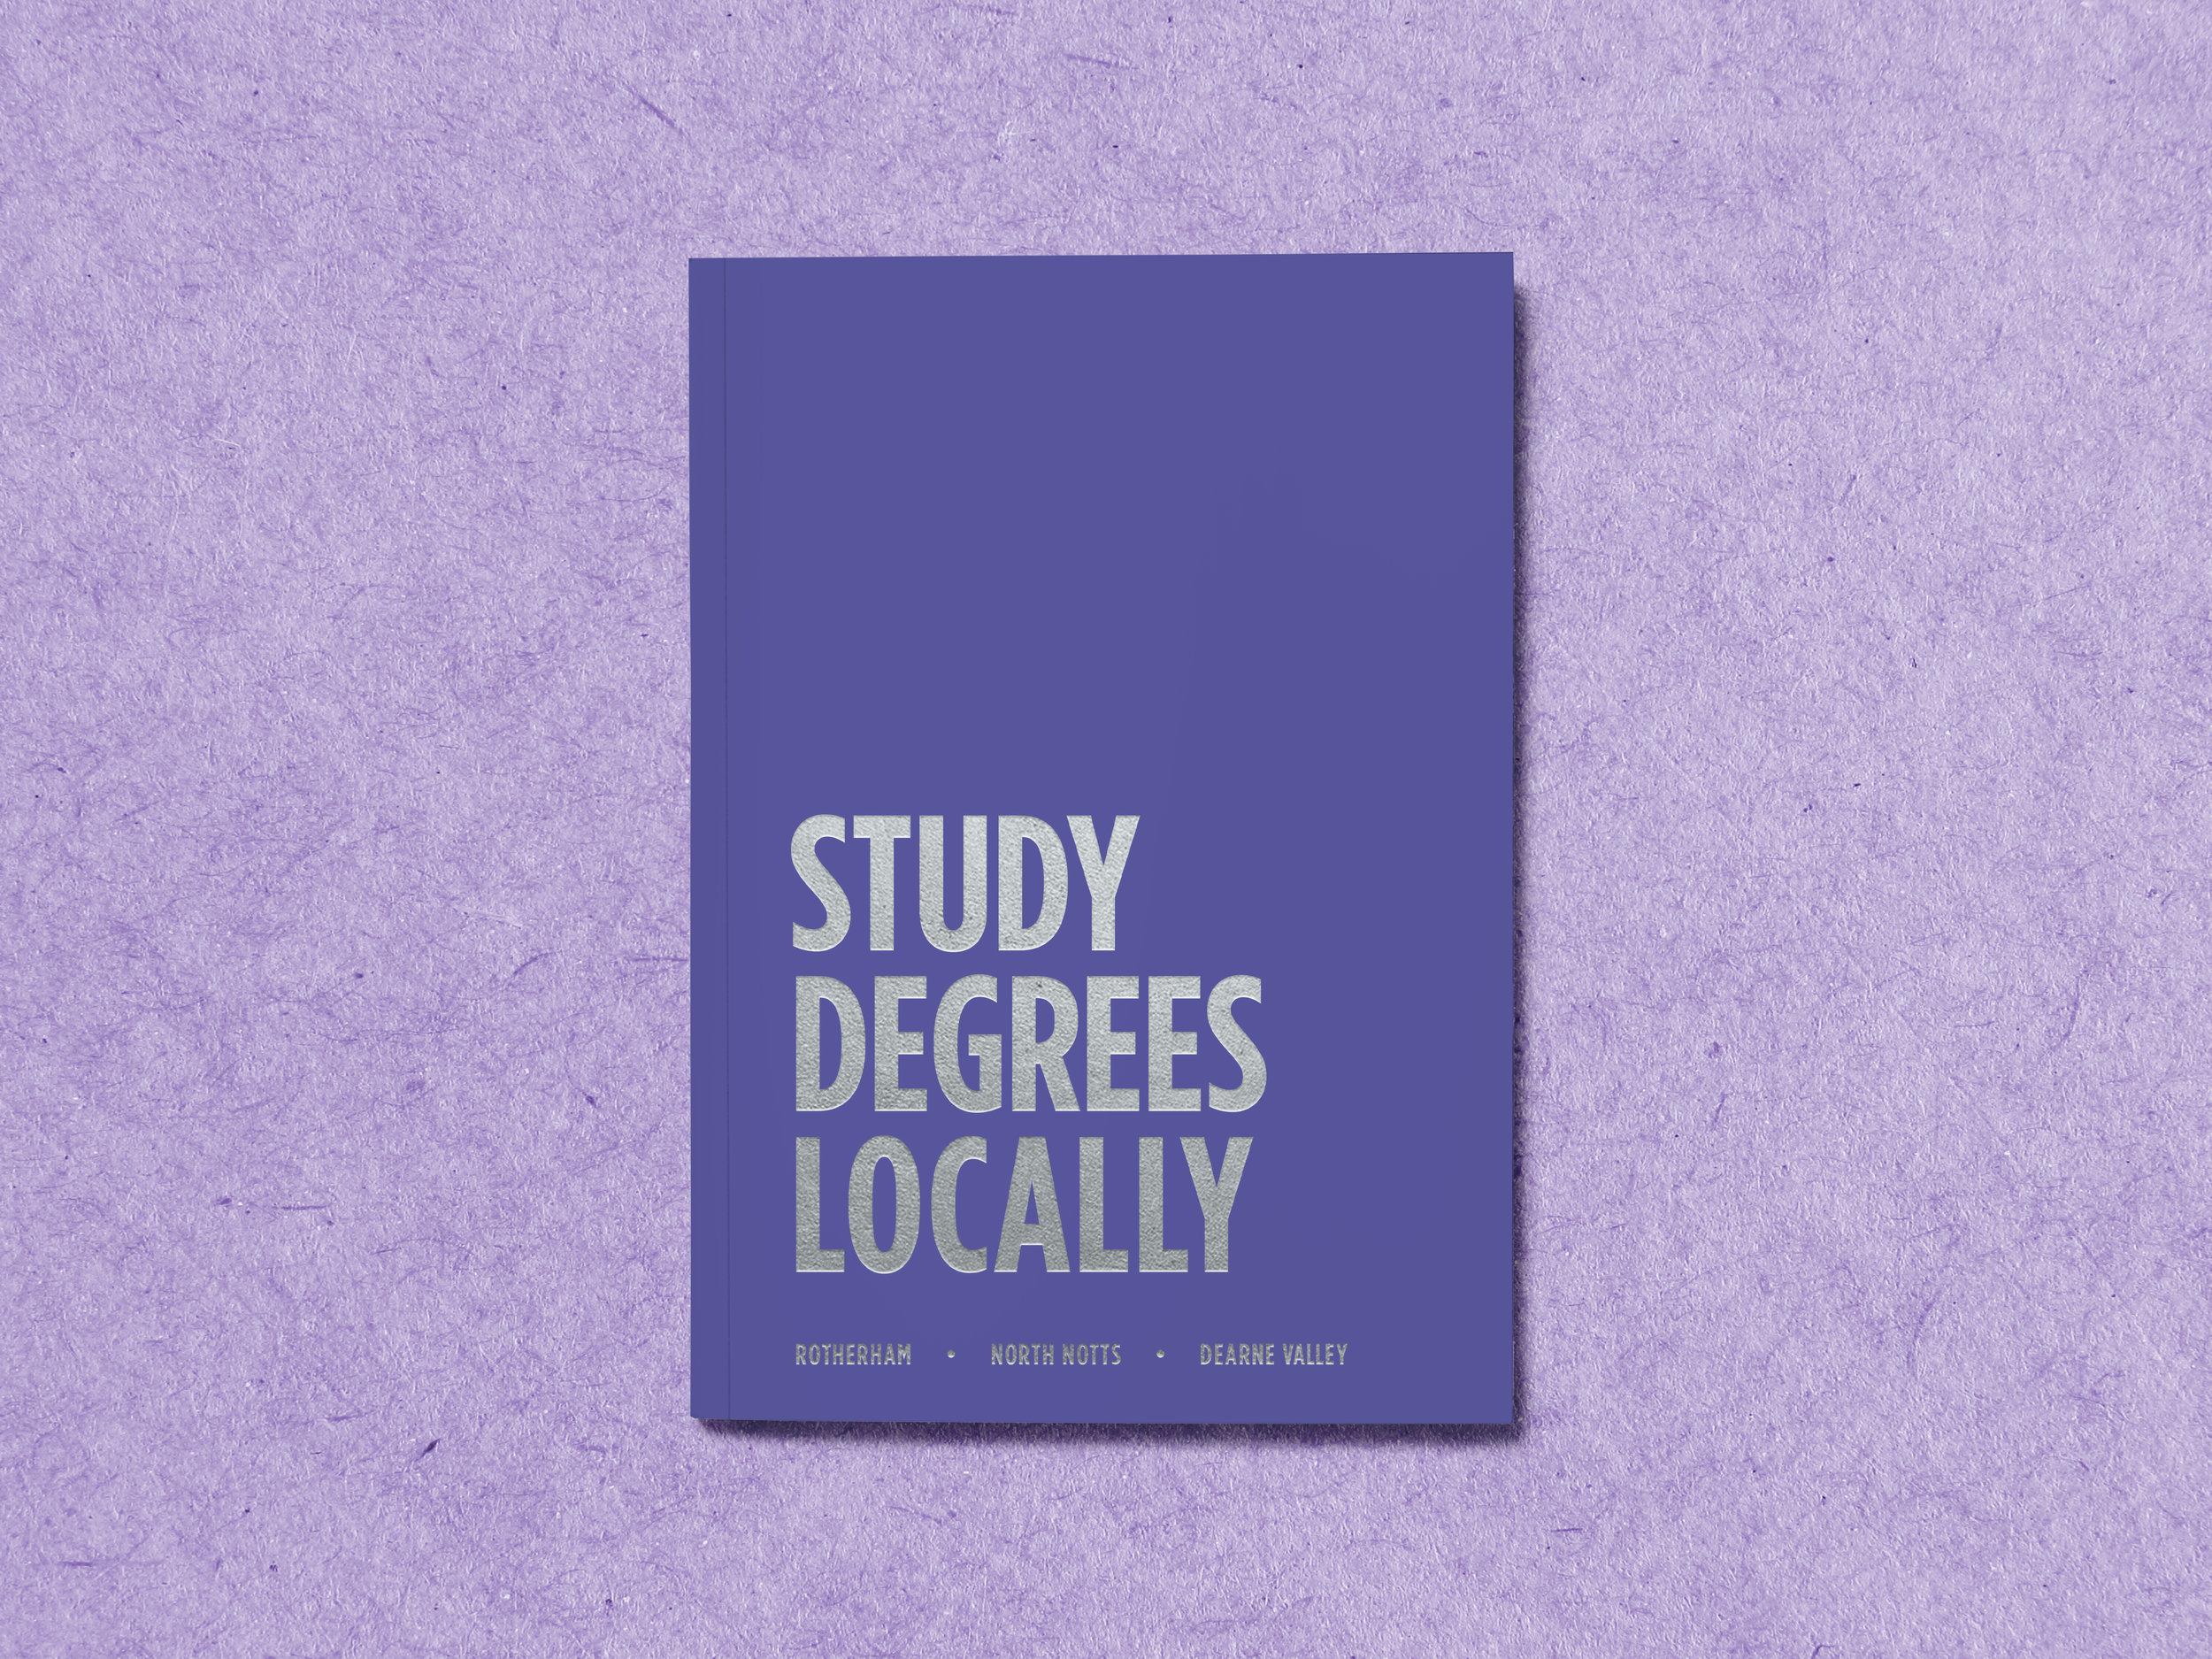 Prospectus Design - Cover Design - Graphic Design Sheffield